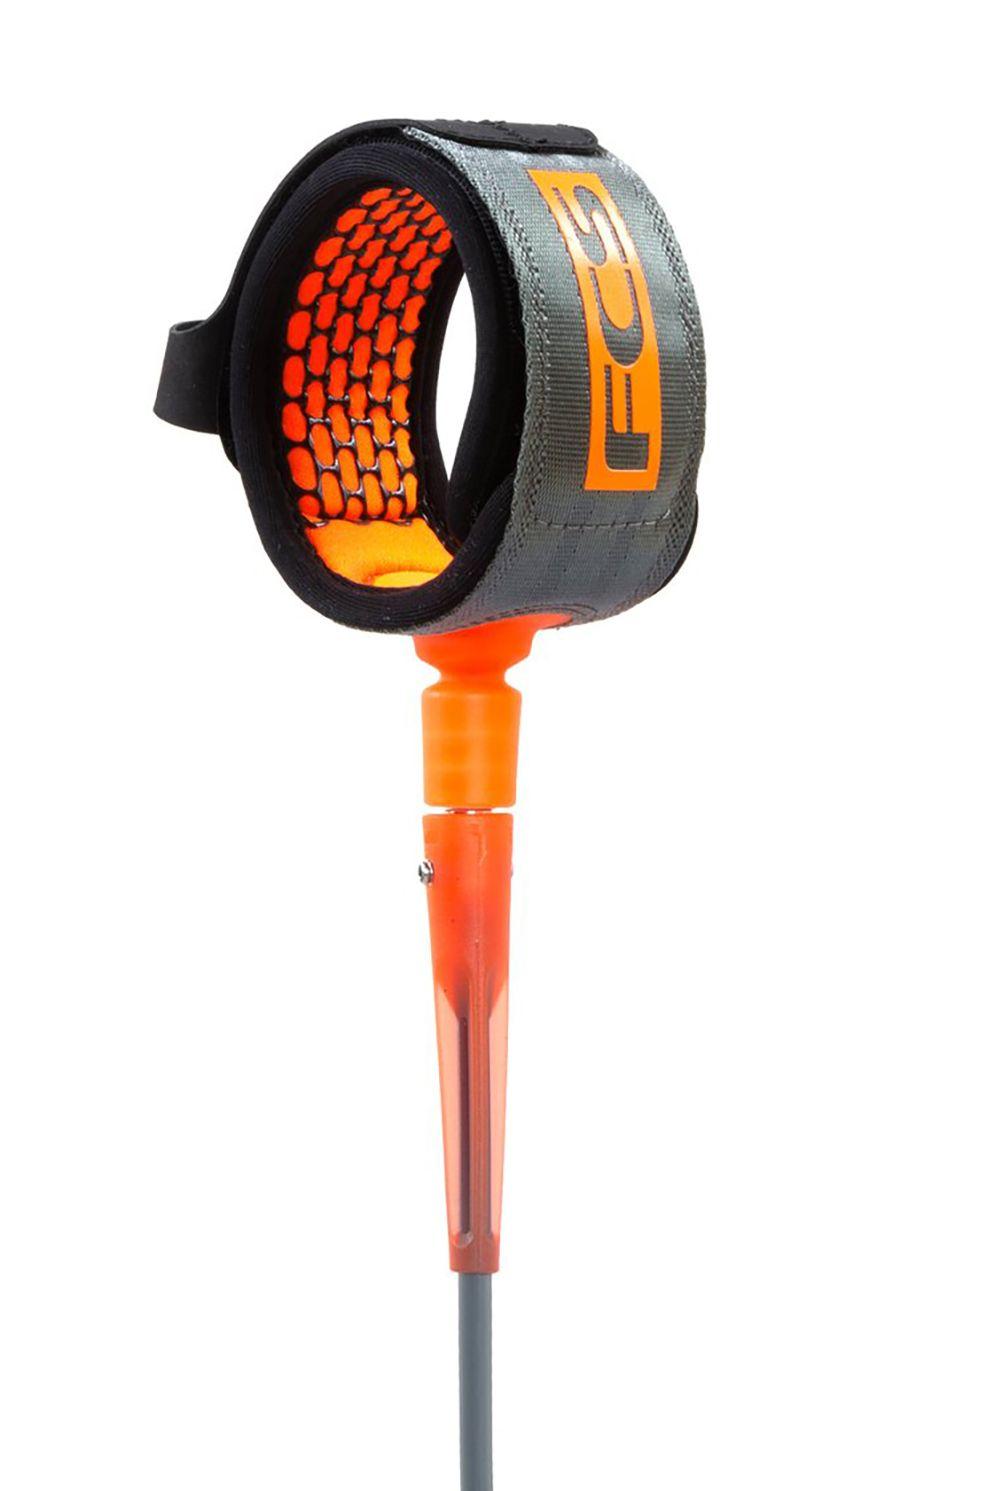 Leash Fcs 6' COMP ESSENTIAL Charcoal/Blood Orange